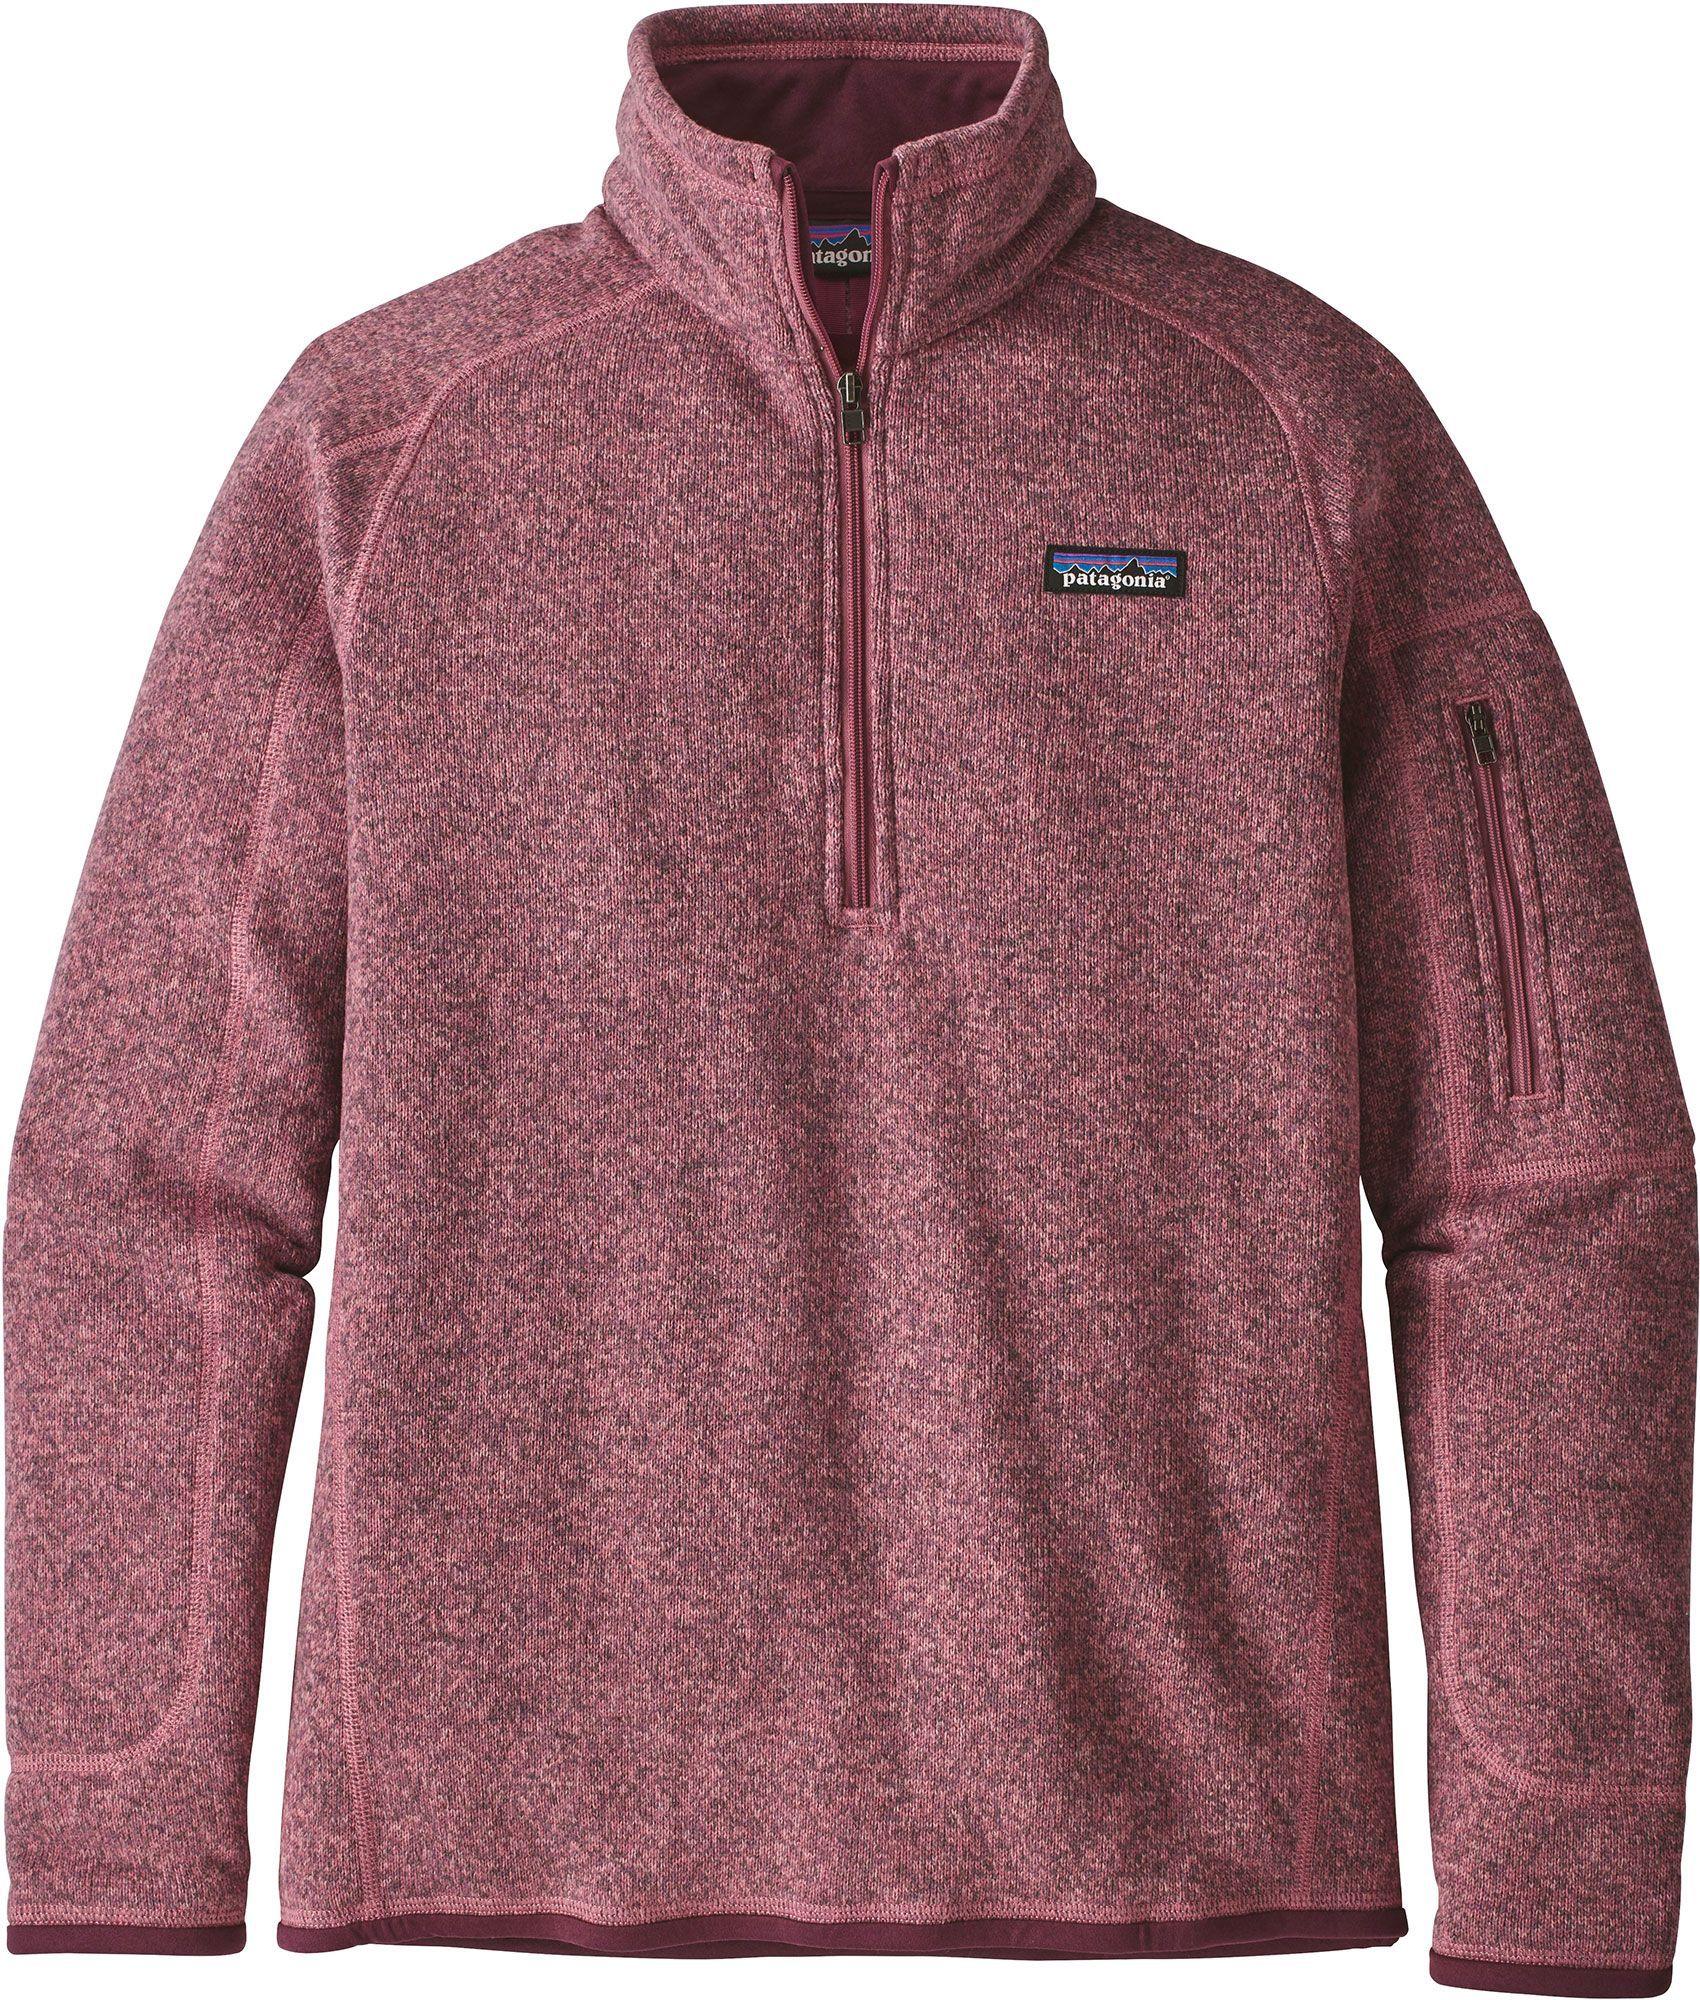 Patagonia Women s Better Sweater Quarter Zip Fleece Jacket in 2019 ... 1f7e04697